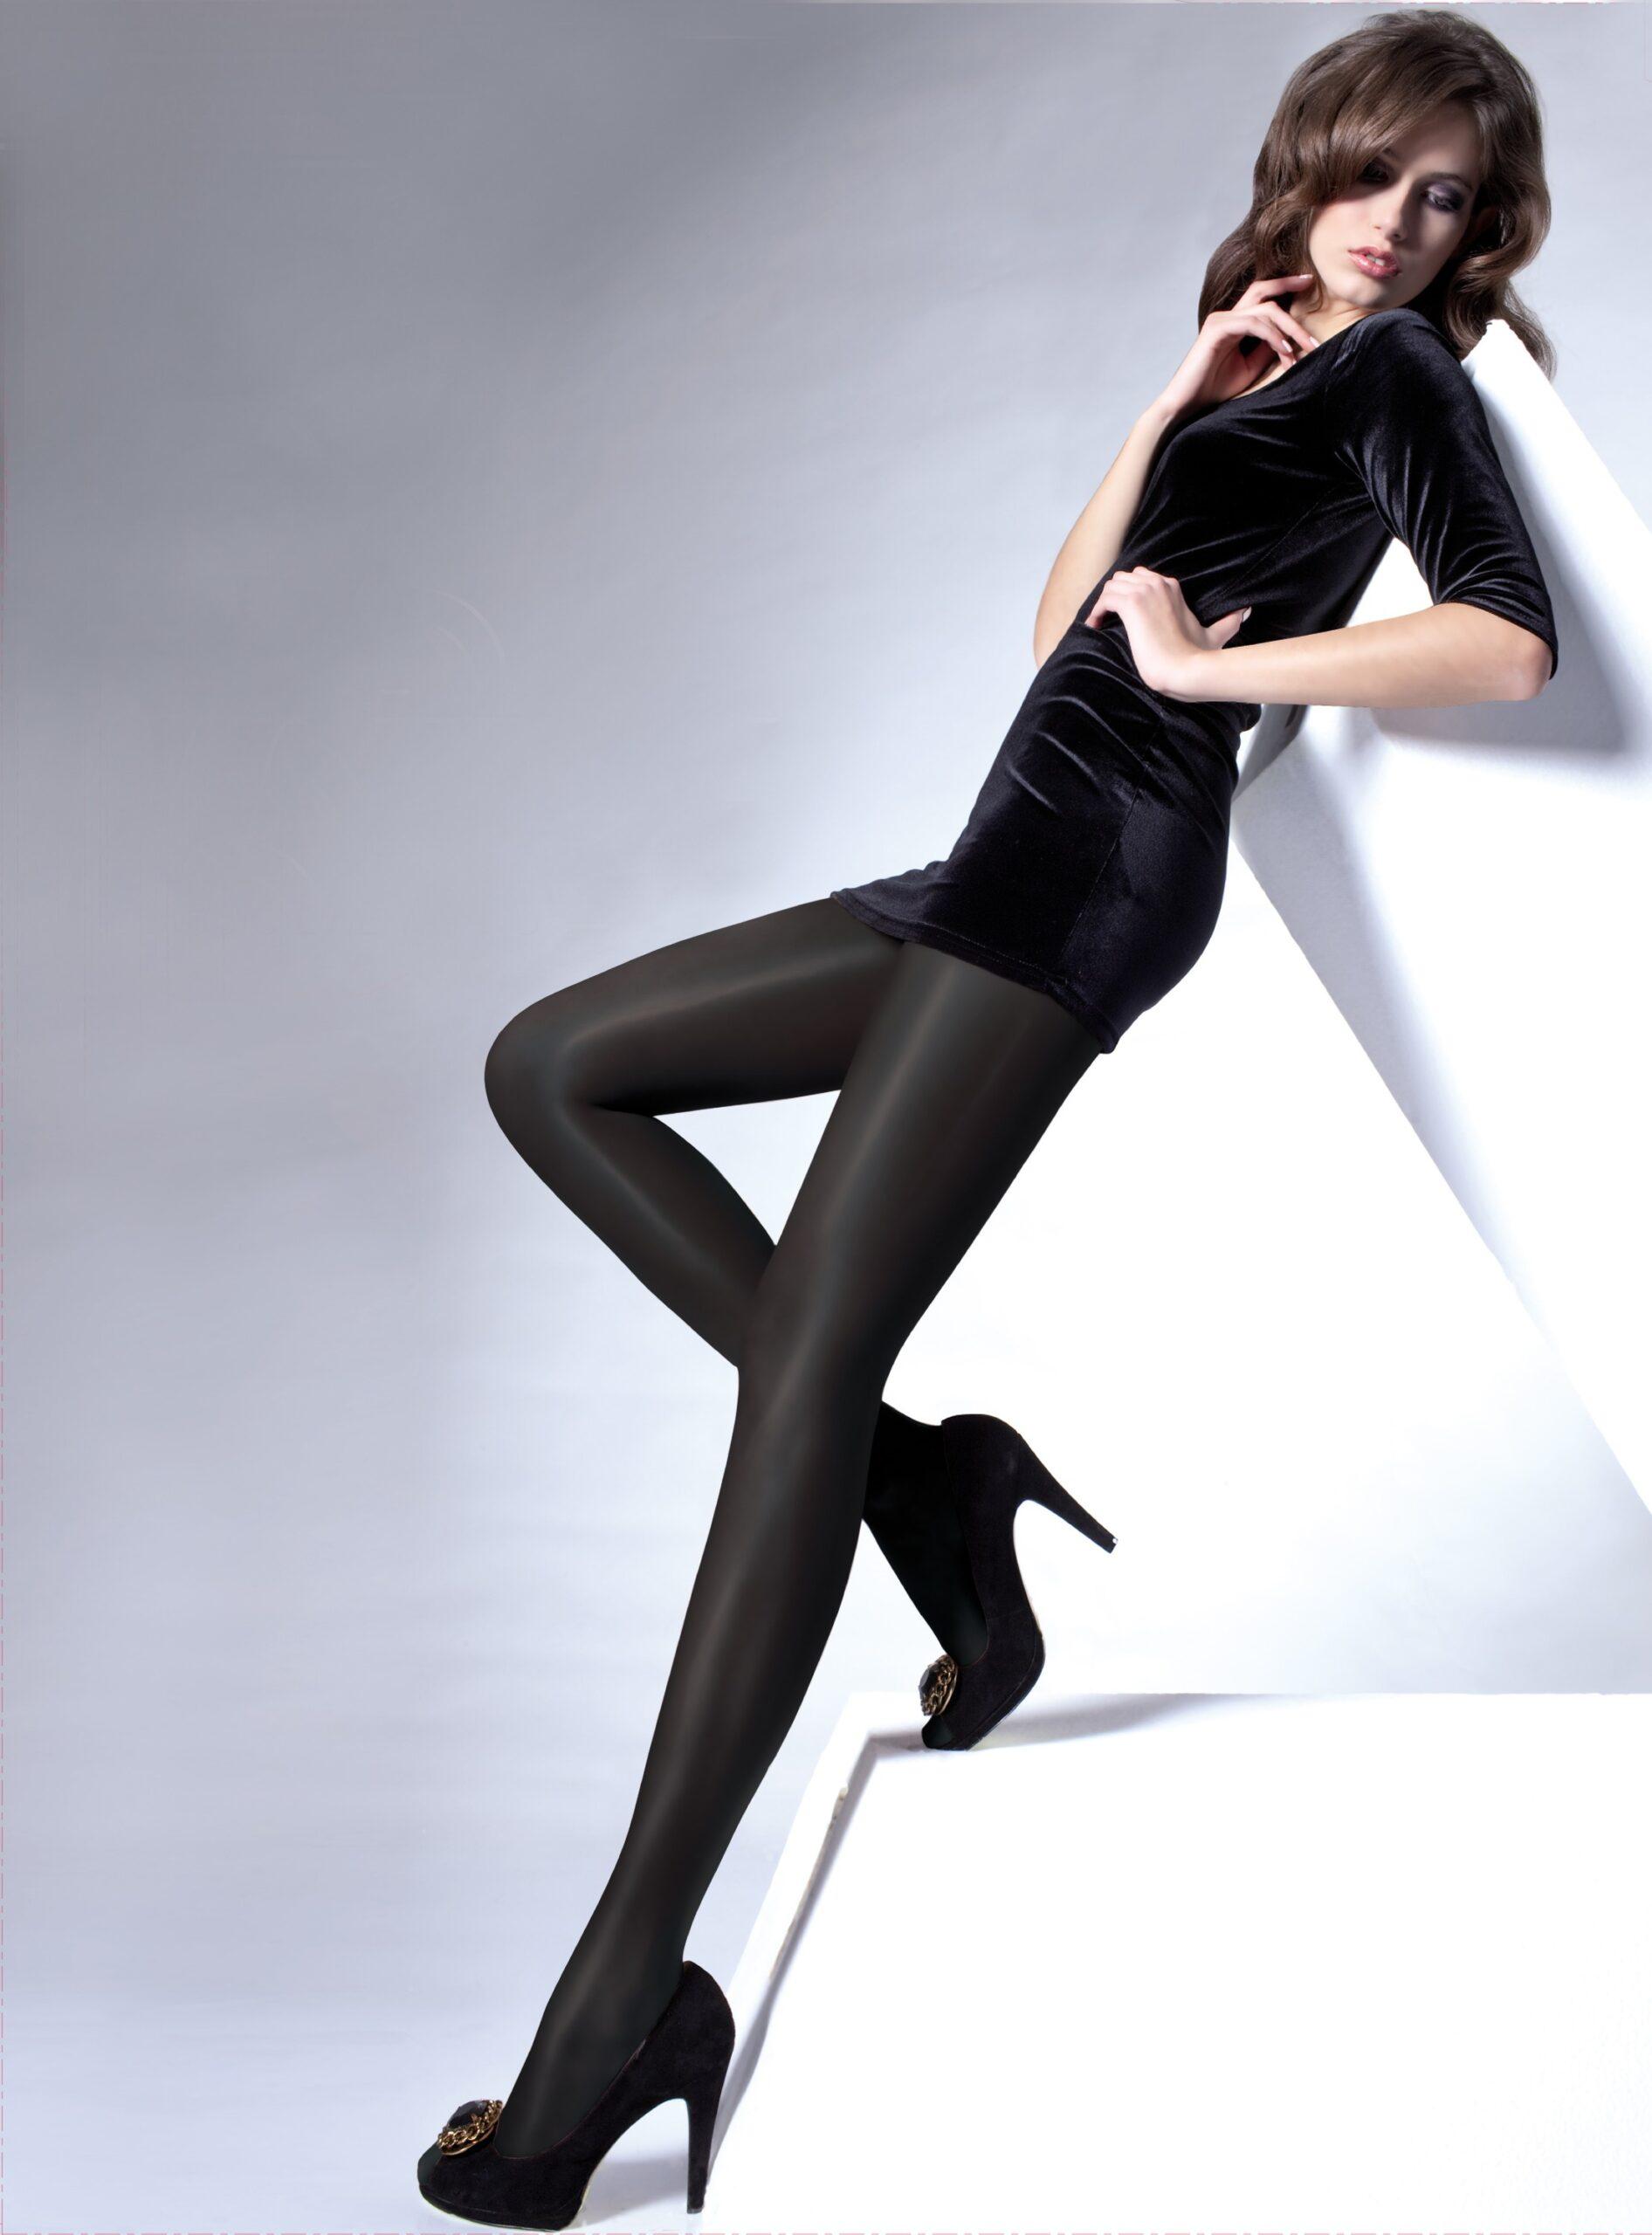 Women's Satin De Luxe Tights 100 Denier 3D, High Gloss, Shiny Opaque Tights By Knittex